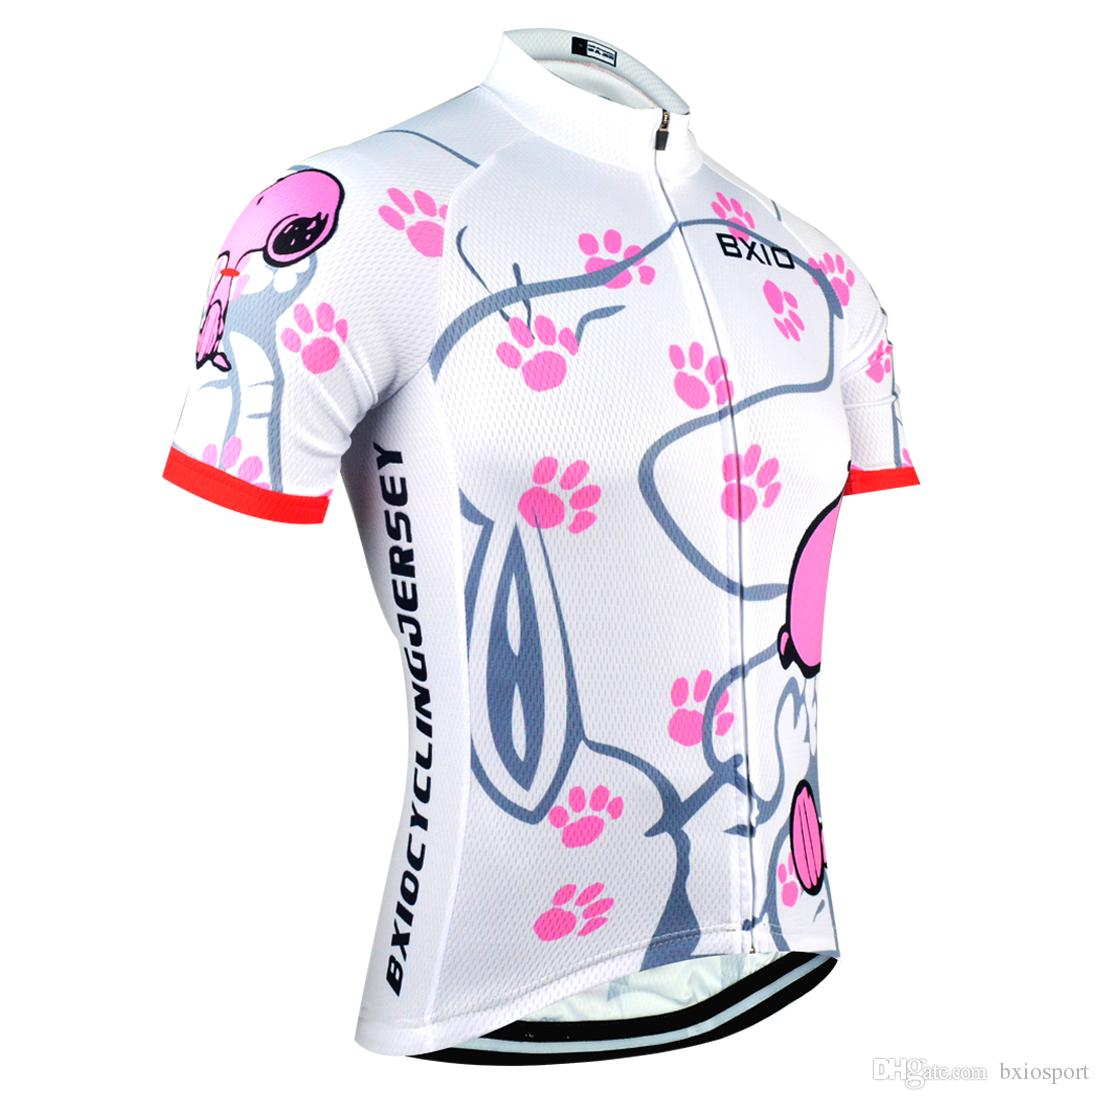 90e9ca45e BXIO Brand Cycling Jersey Women Short Sleeve Sport Jersey Summer Cool  Snoopy Bike Clothing Pro Team Equipe De France BX 0209W021 J Custom Bike  Jerseys ...